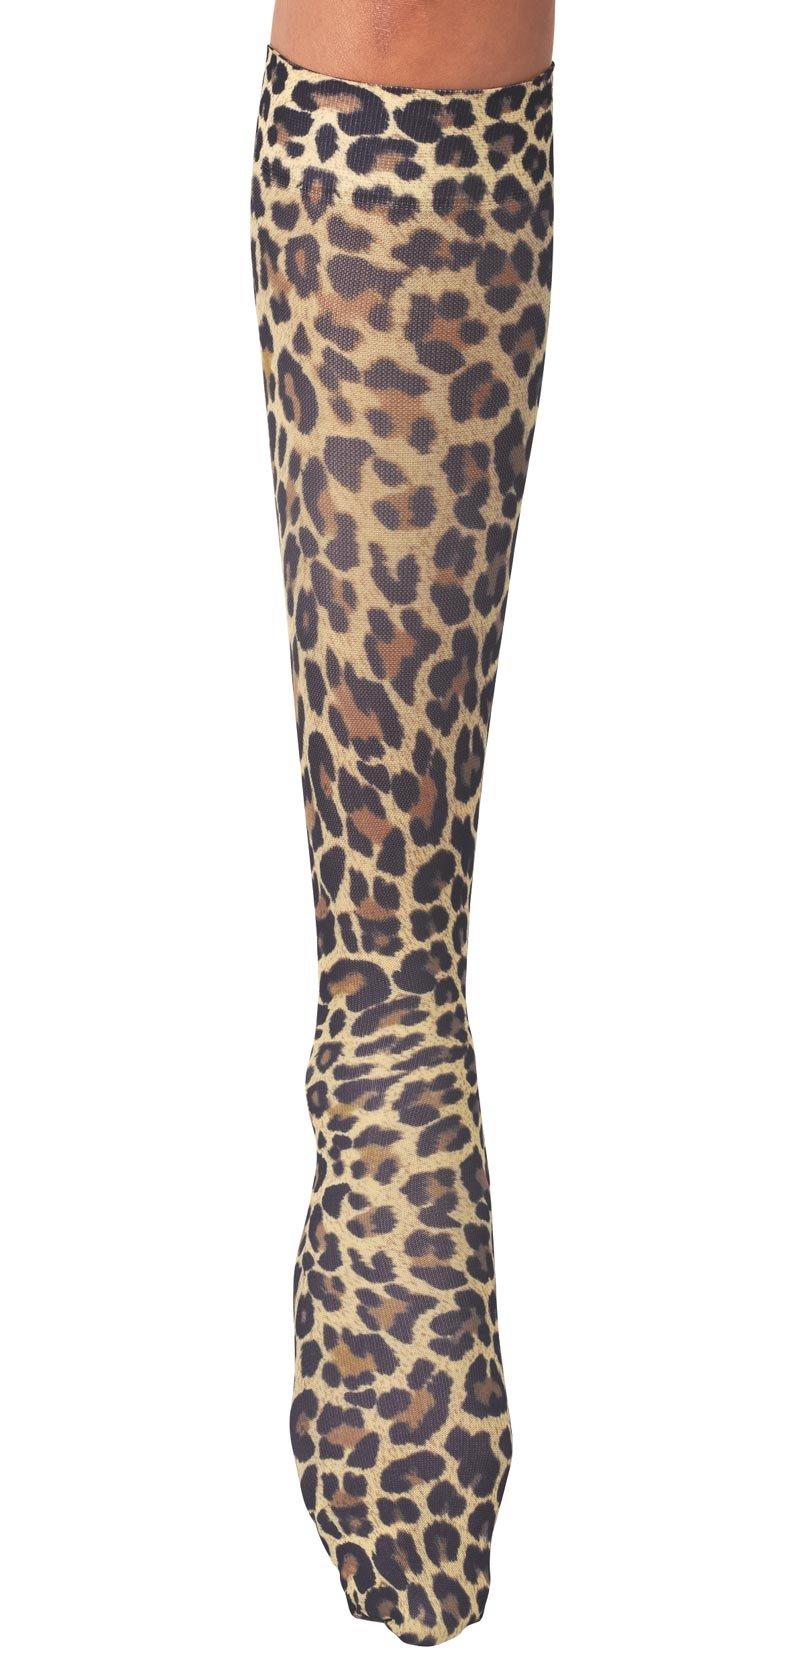 EasyComforts Celeste Stein Compression Socks, 15-20 mmHg